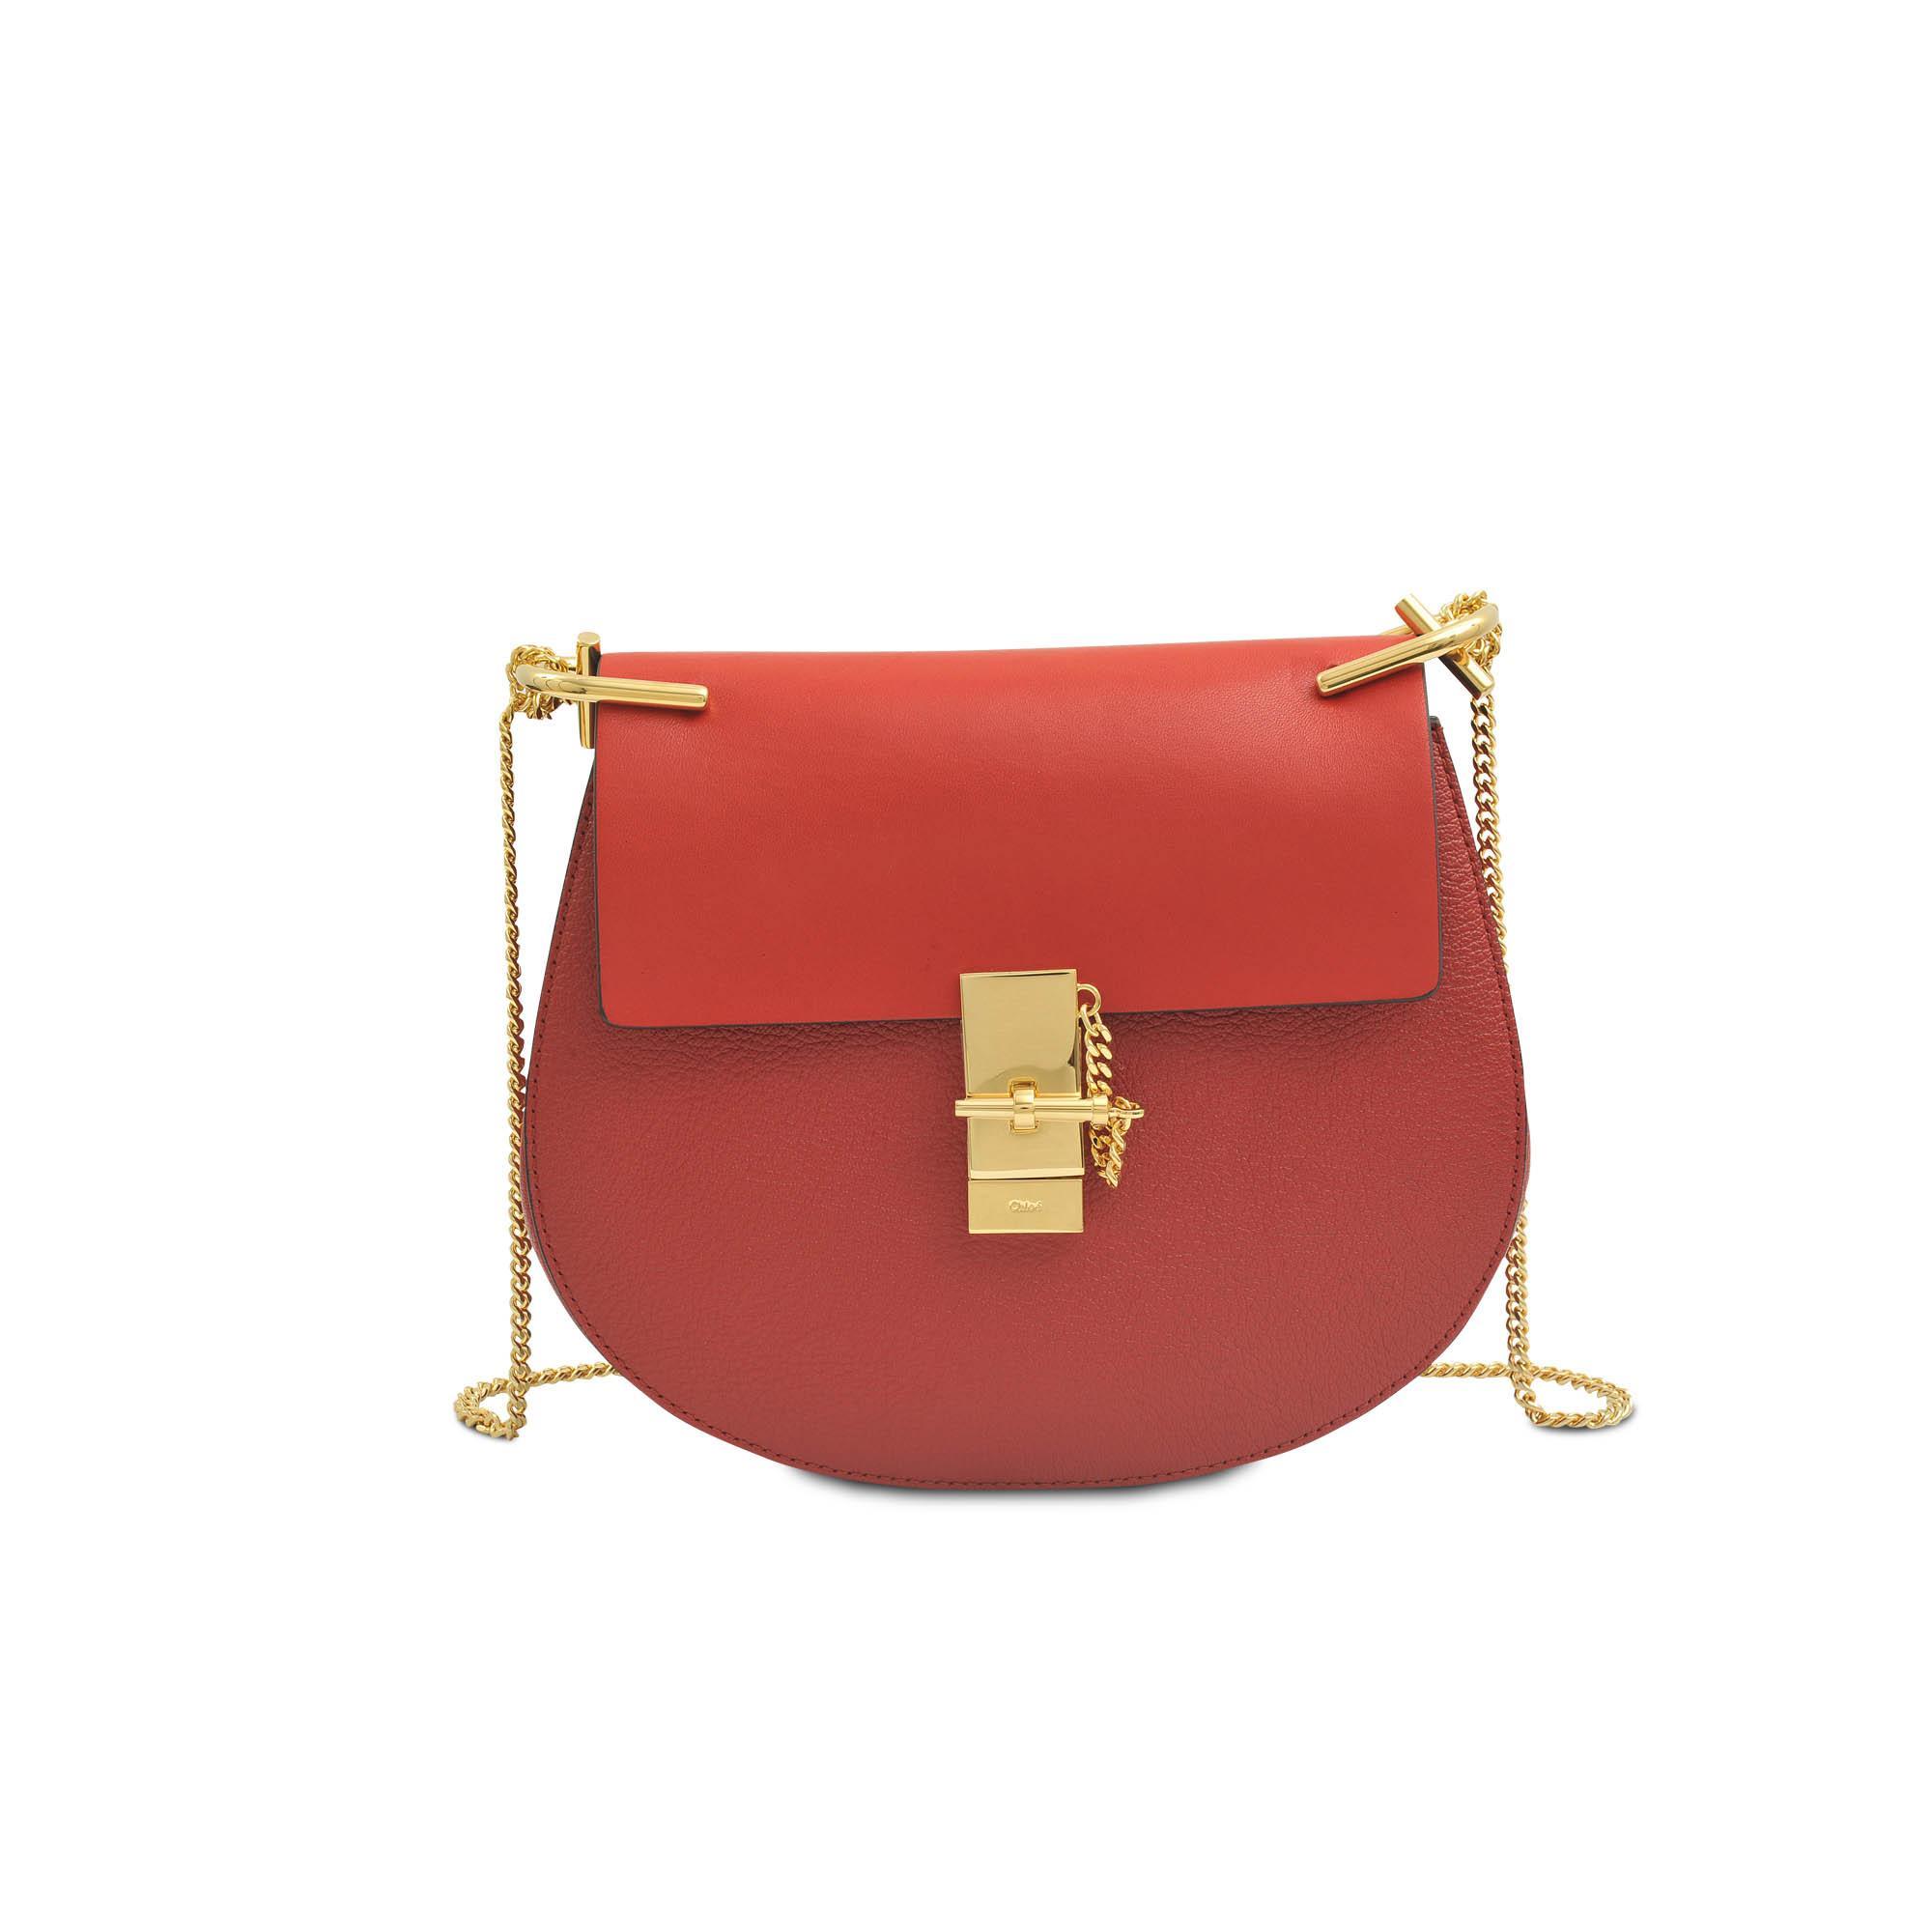 chlo drew medium chain bag in red lyst. Black Bedroom Furniture Sets. Home Design Ideas